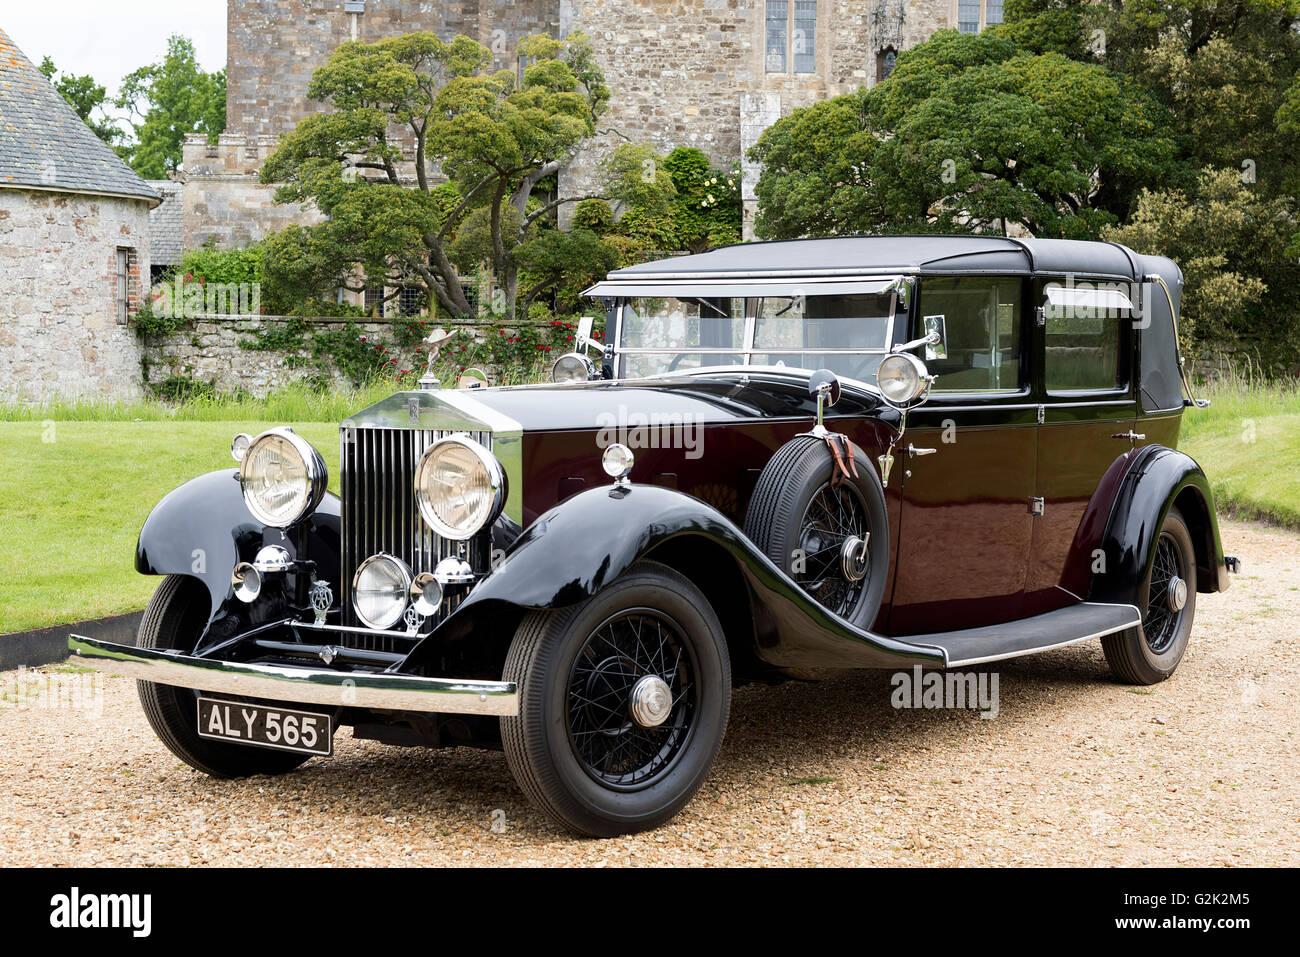 1933 rolls royce phantom ii sedanca de ville stock photo, royalty